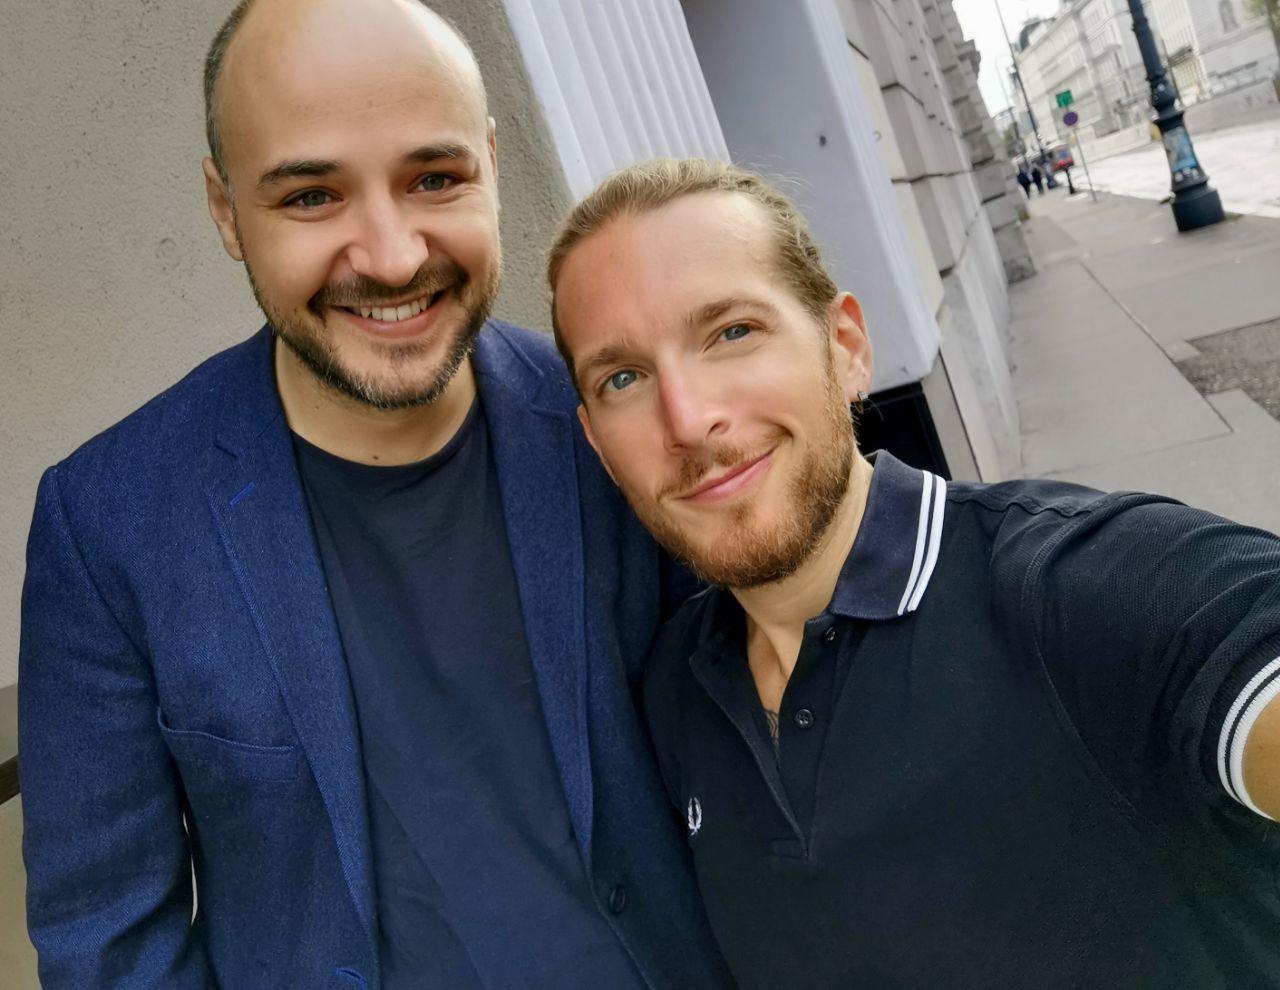 Selfie mit Mike Edison street.jpeg